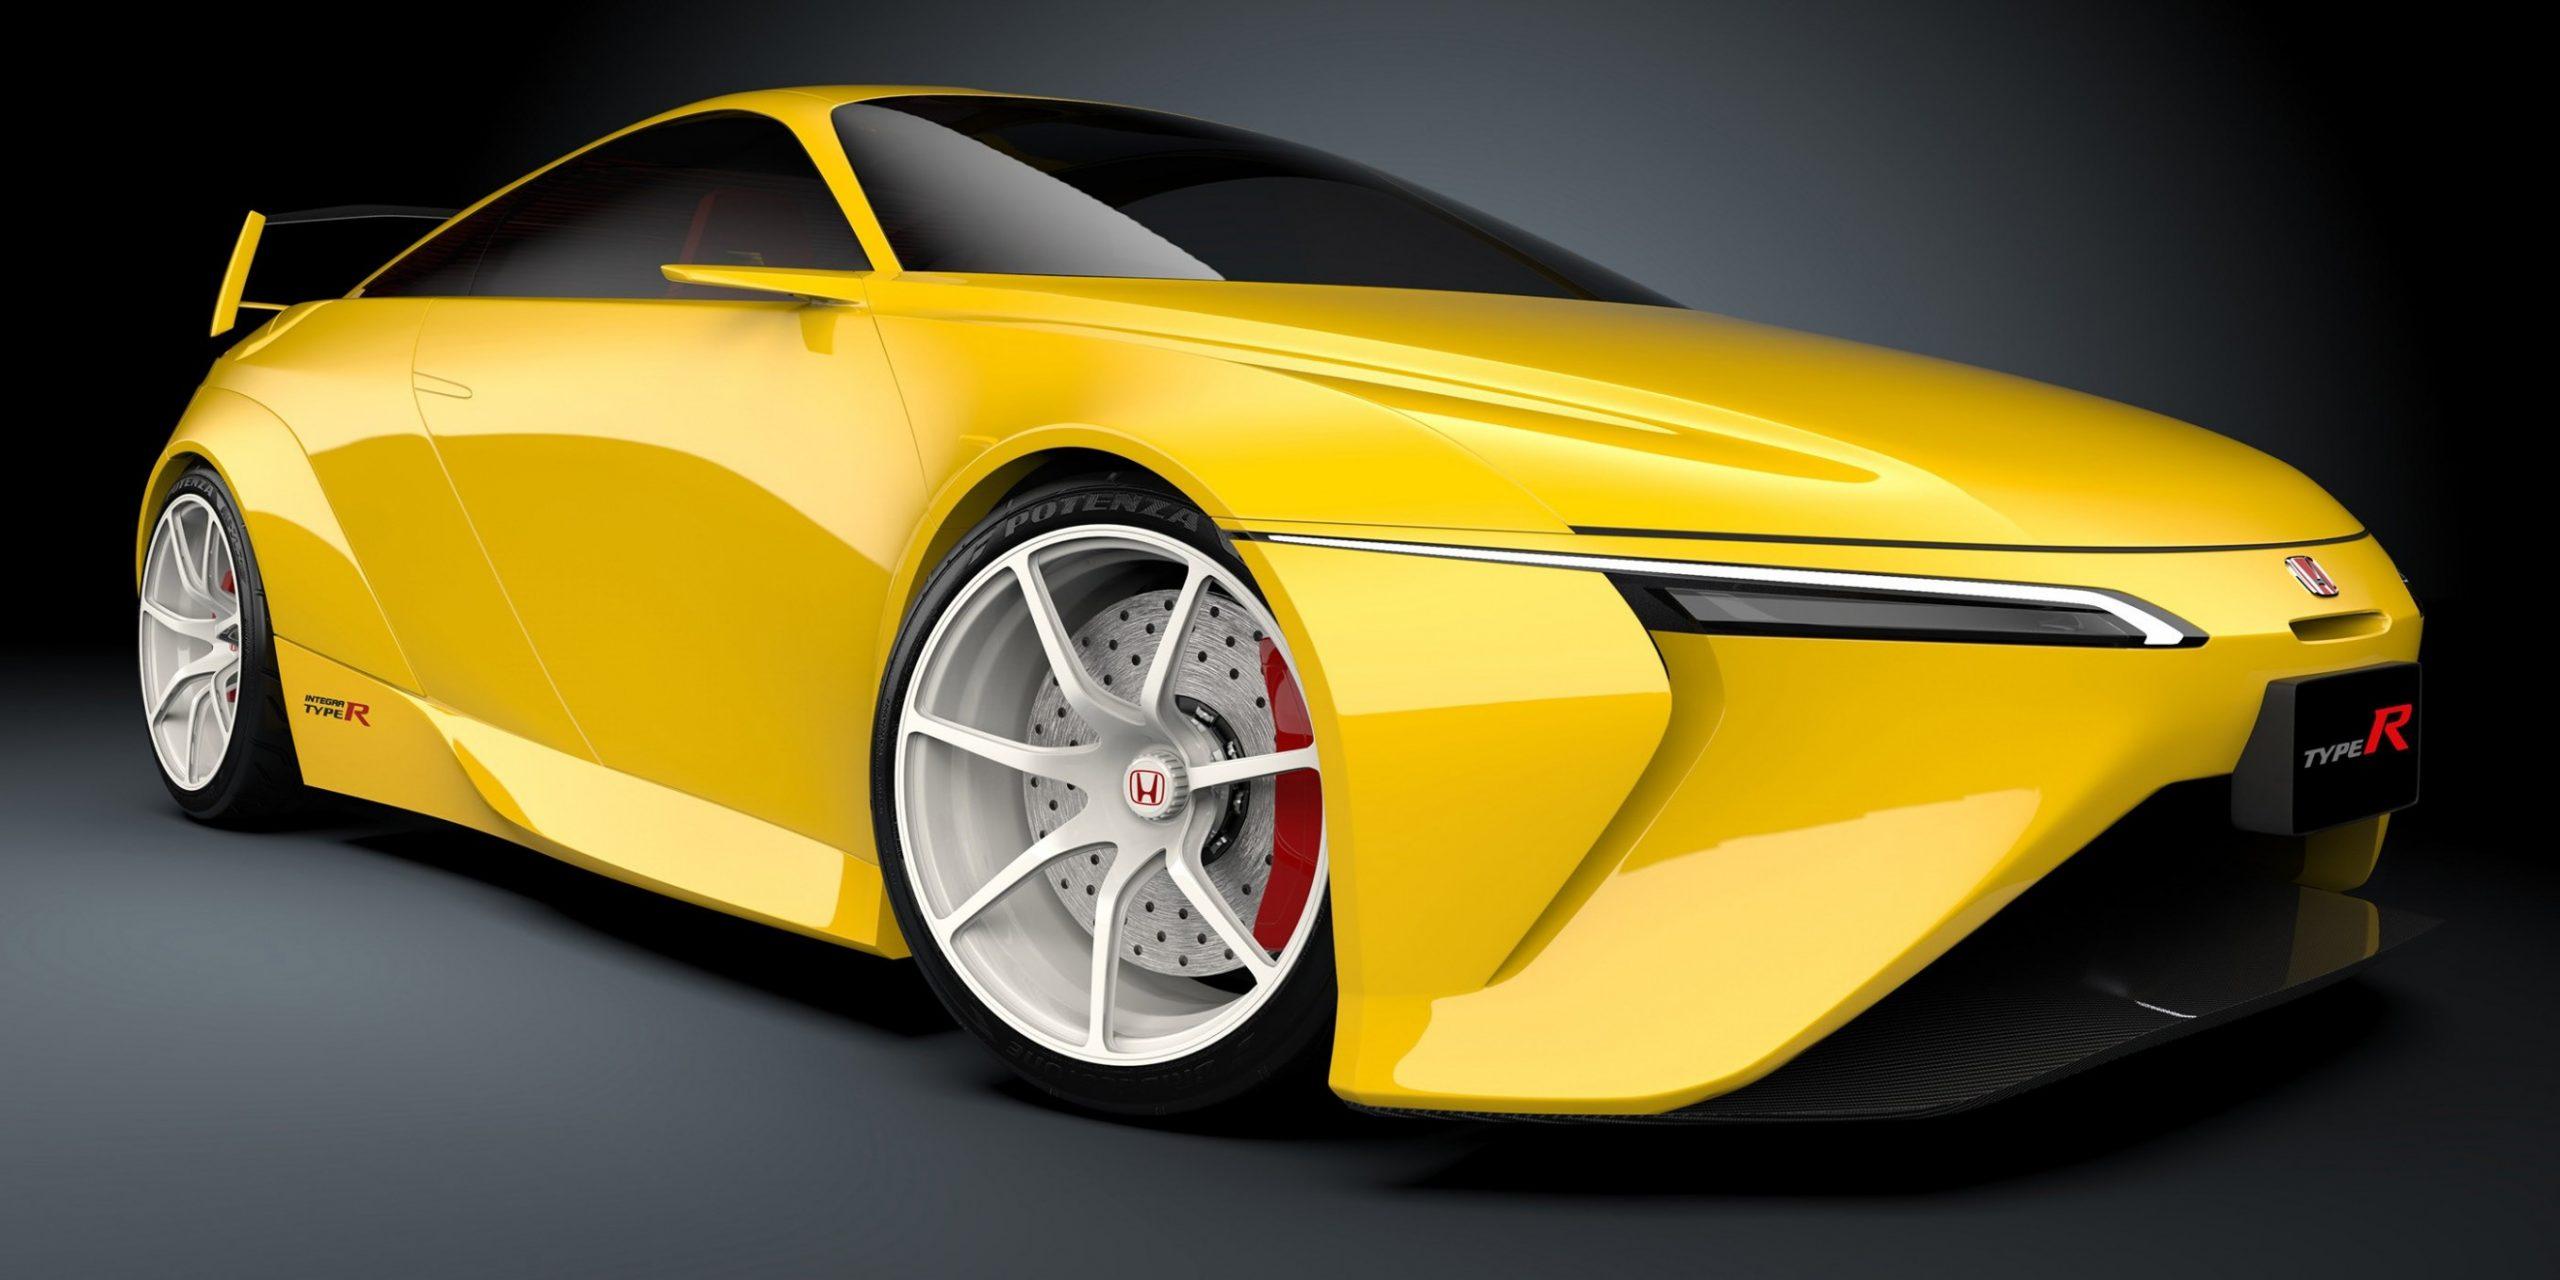 Modern Honda Integra Type-R Rendering Shows Long Overdue JDM - Acura Integra Type R 2021